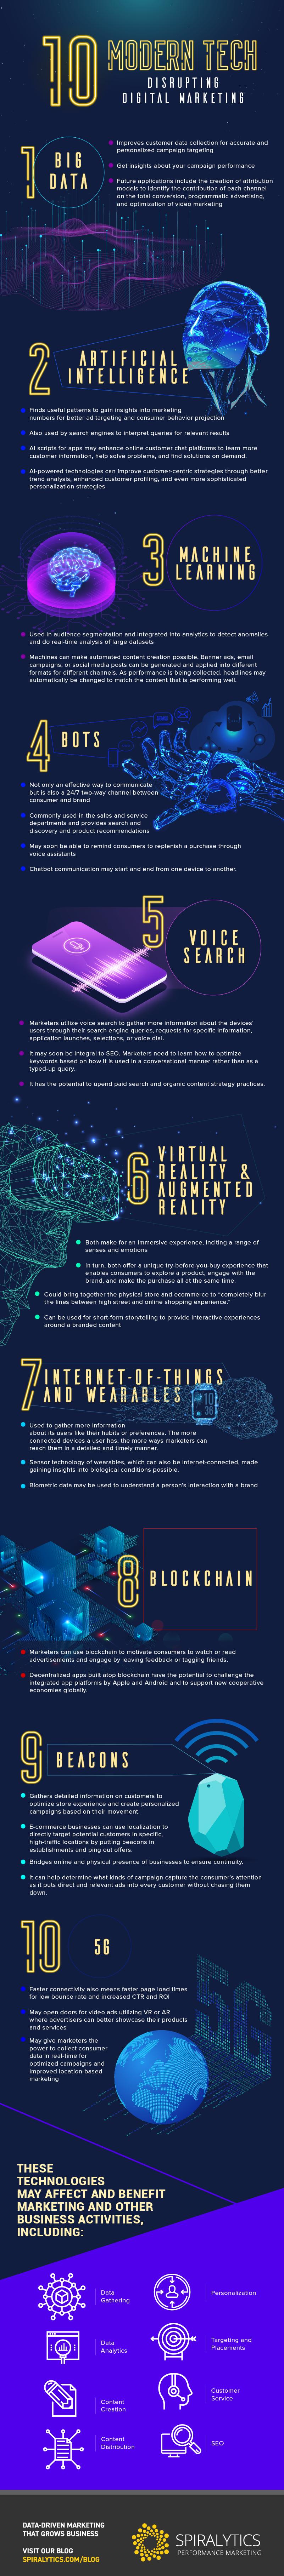 Infographic: Technology Disrupting Digital Marketing